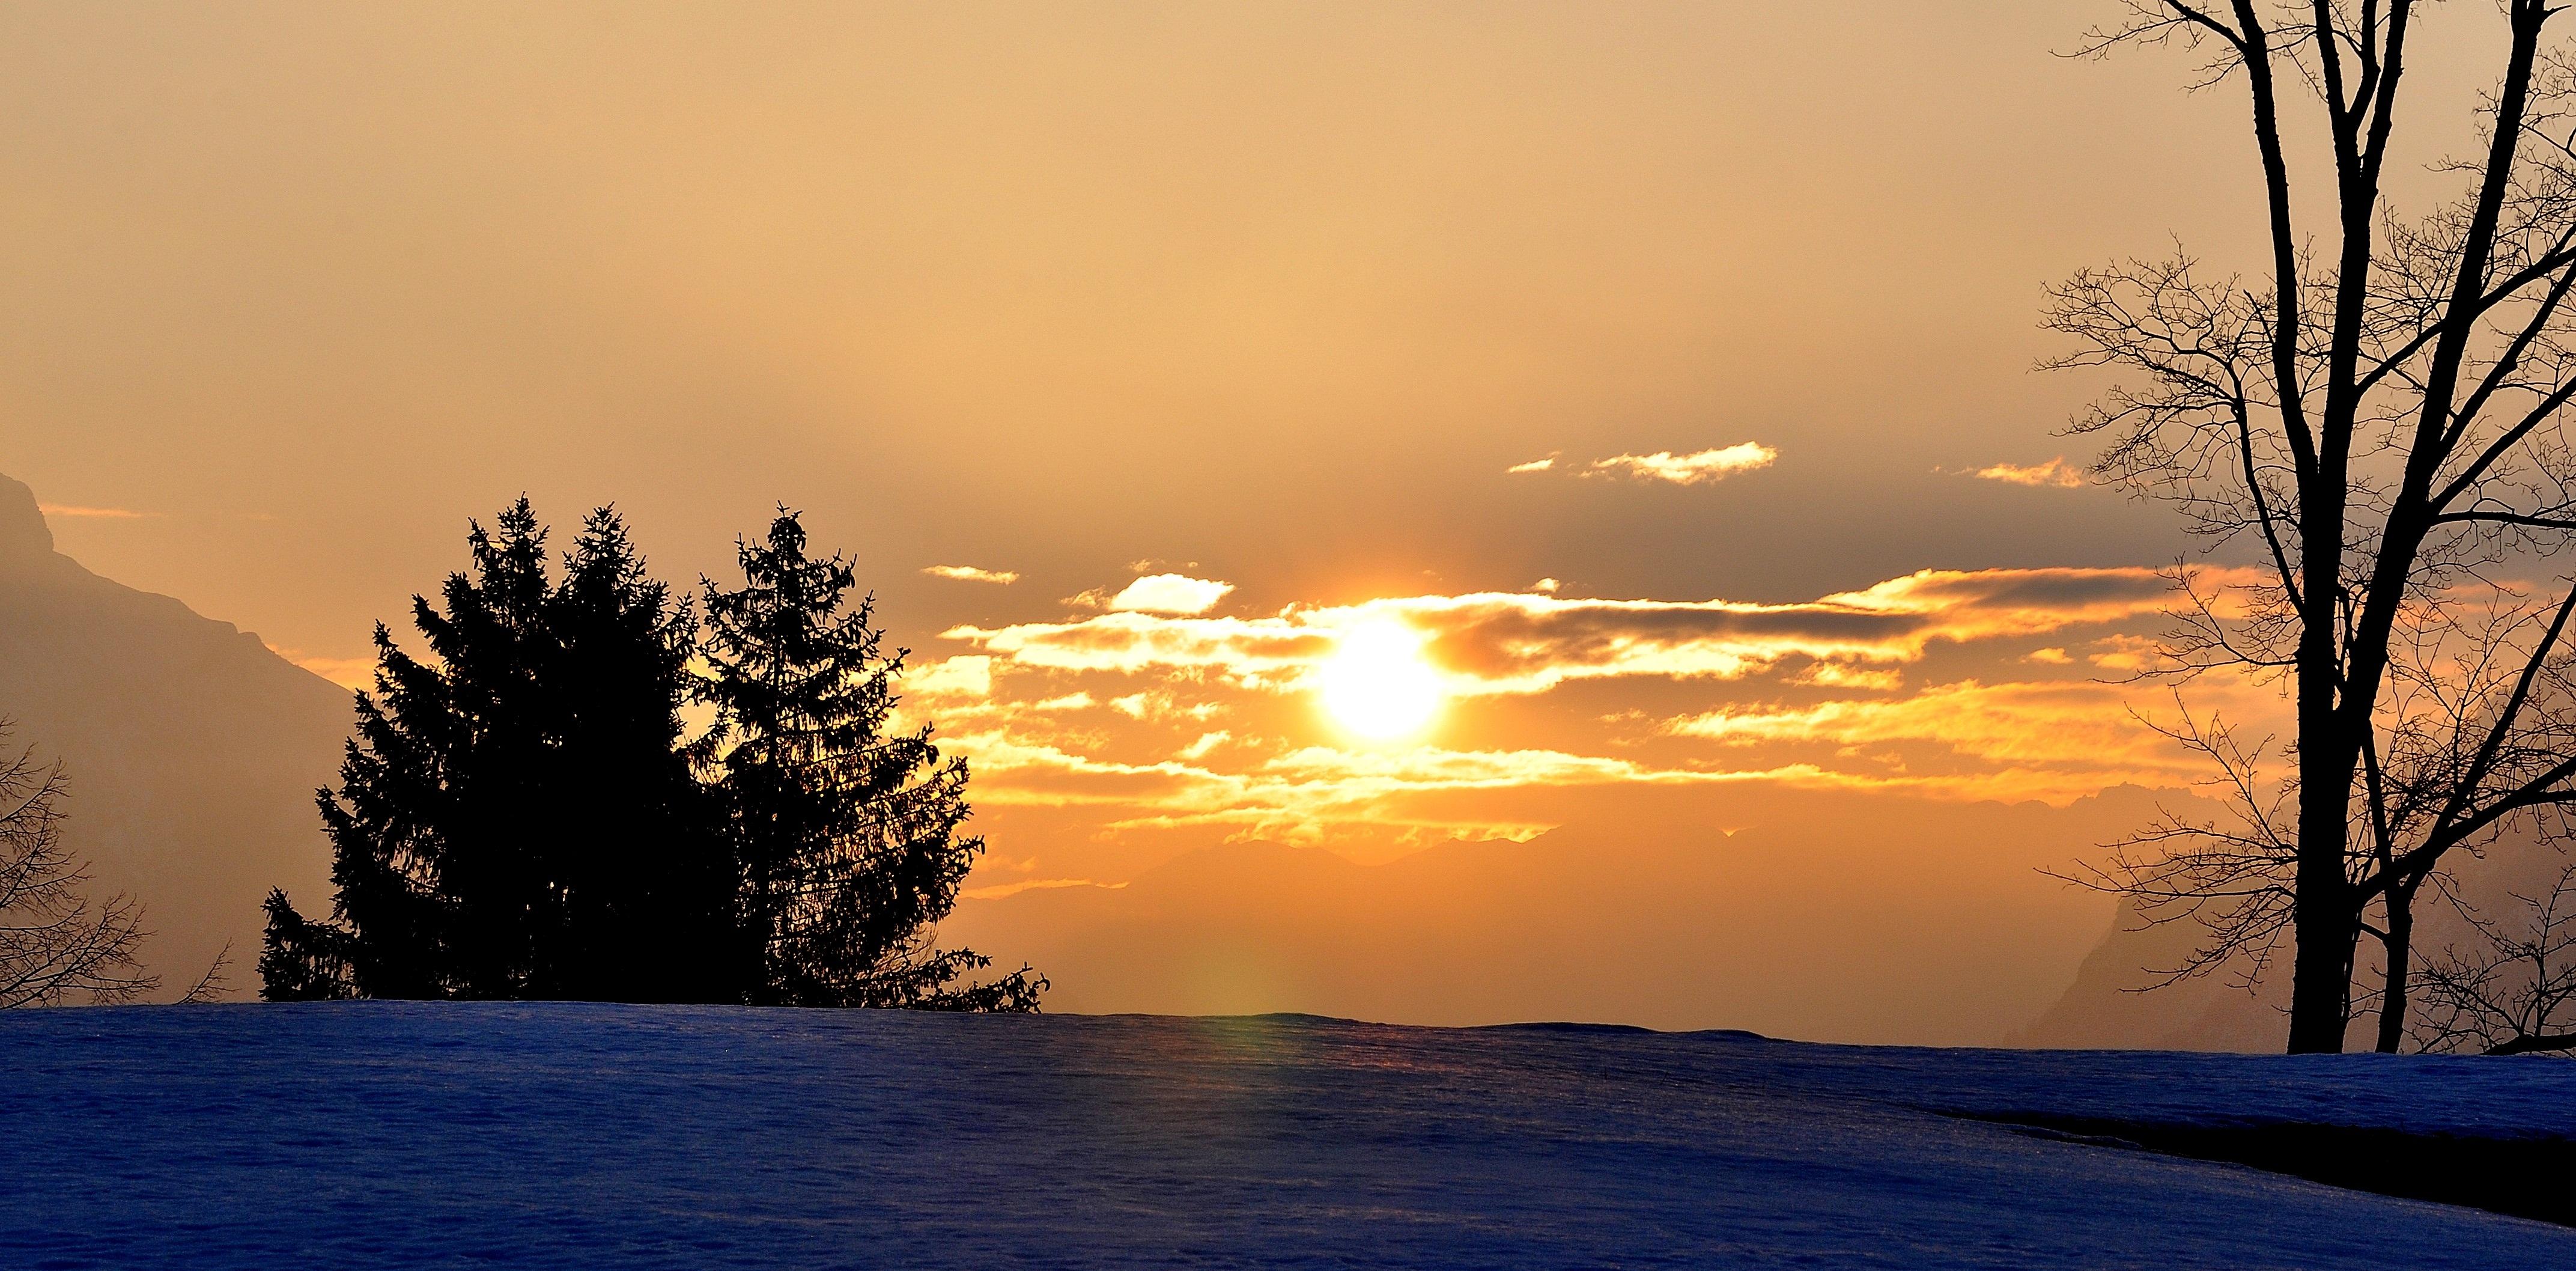 Landscape, Cold, Ice, Mountain, Nature, HQ Photo